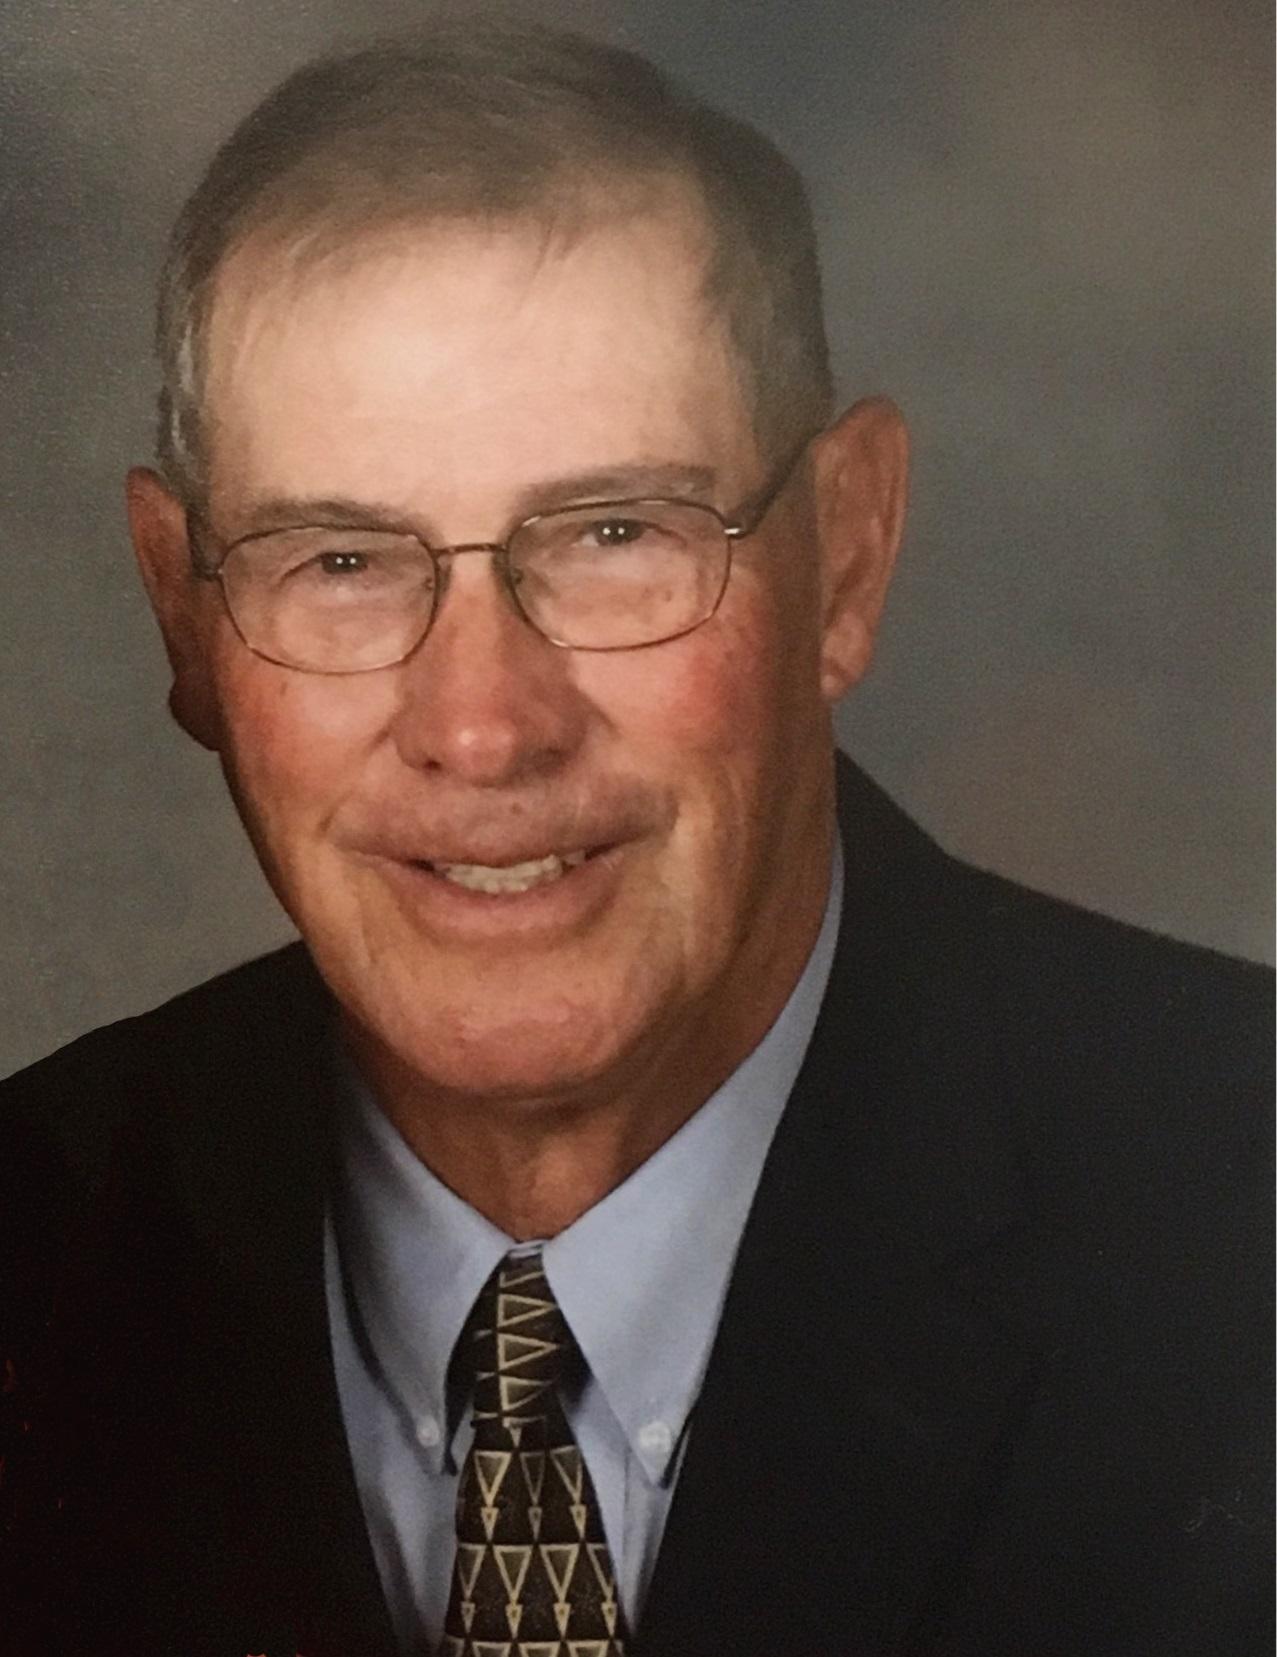 Richard W. Langemeier, age 80, of Scribner